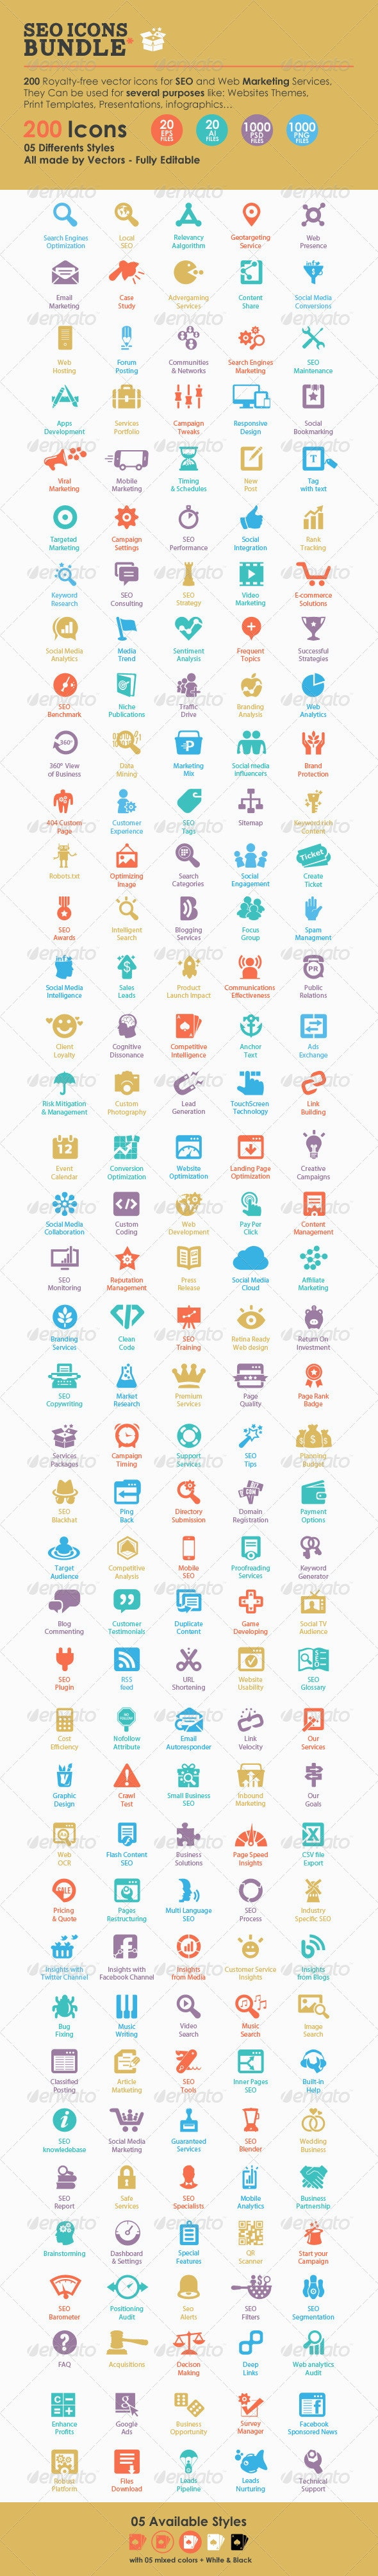 SEO Icons Bundle - Web Icons